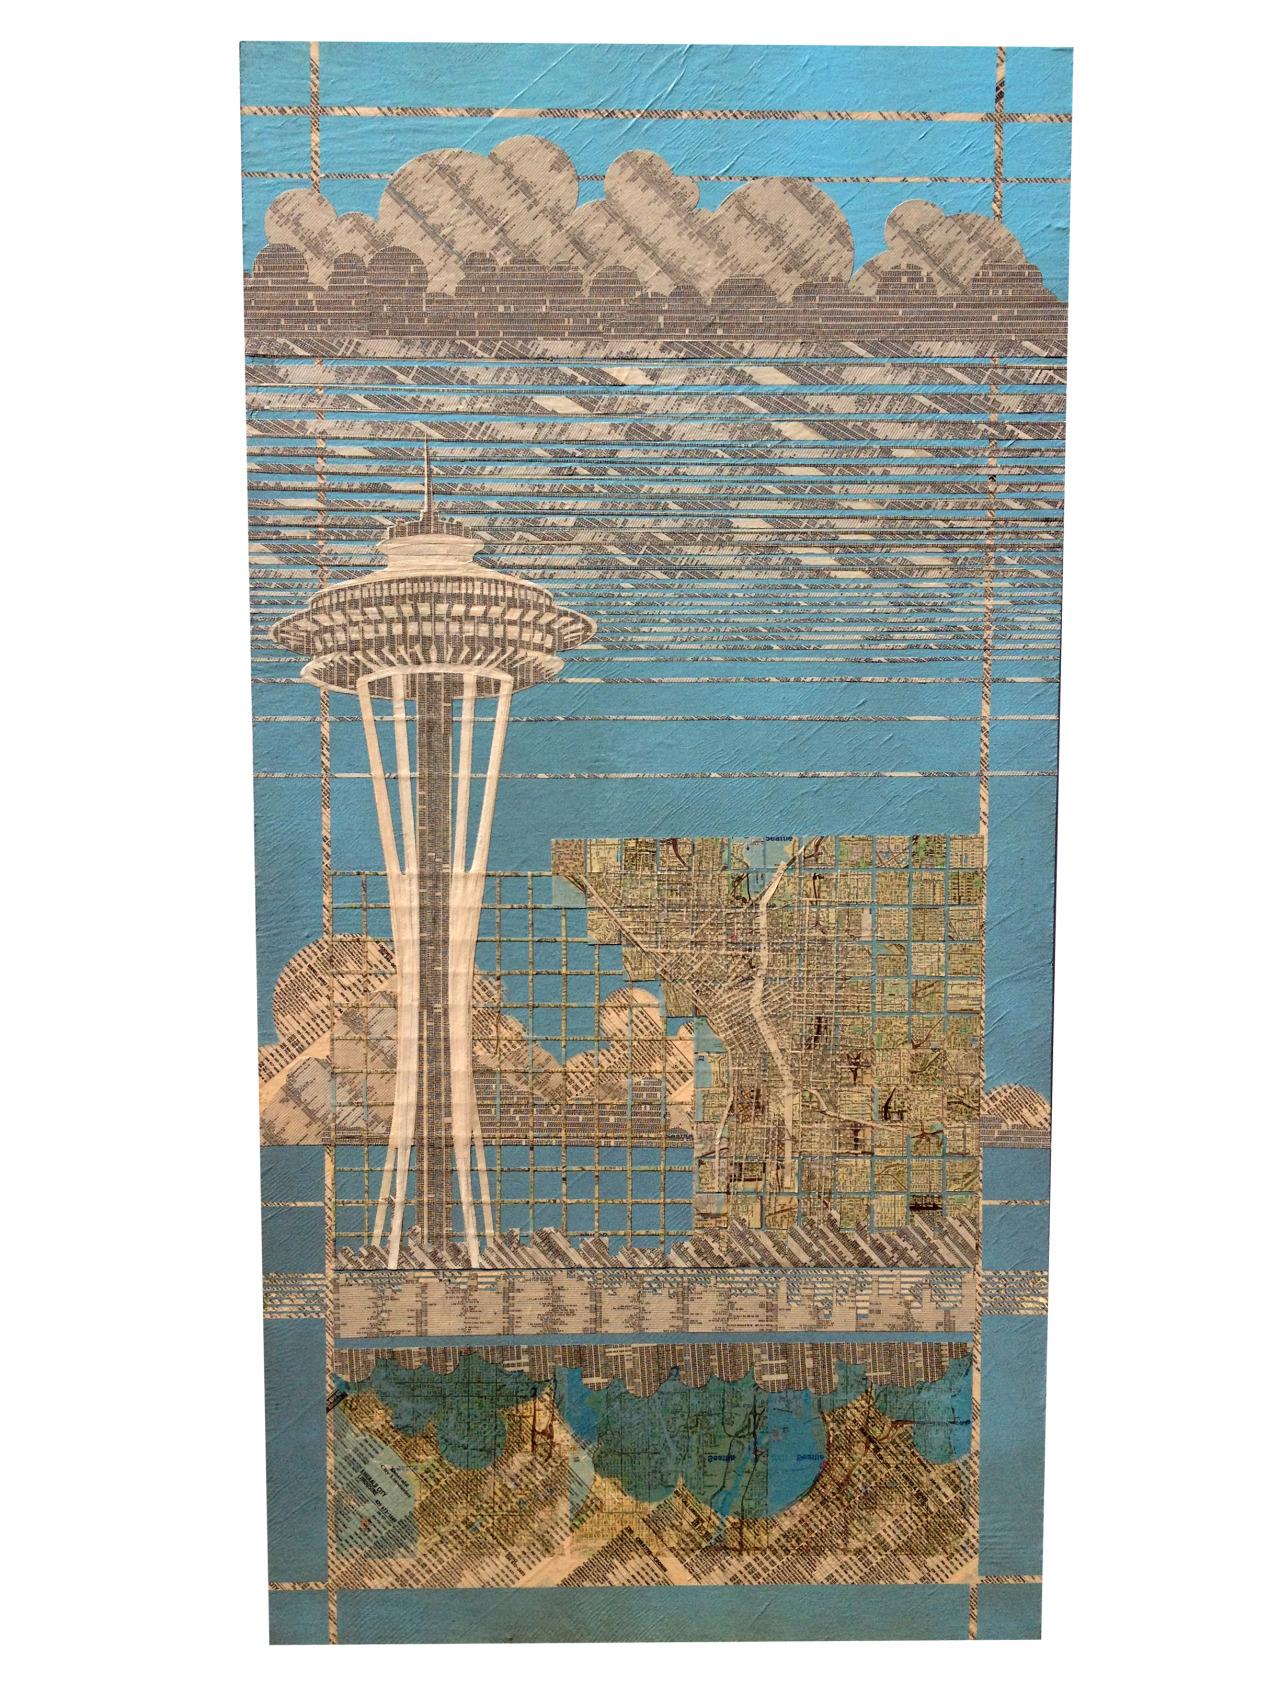 "City Center , Lucky - 48"" x 36"" - Phone book on plywood - $333 starting bid"